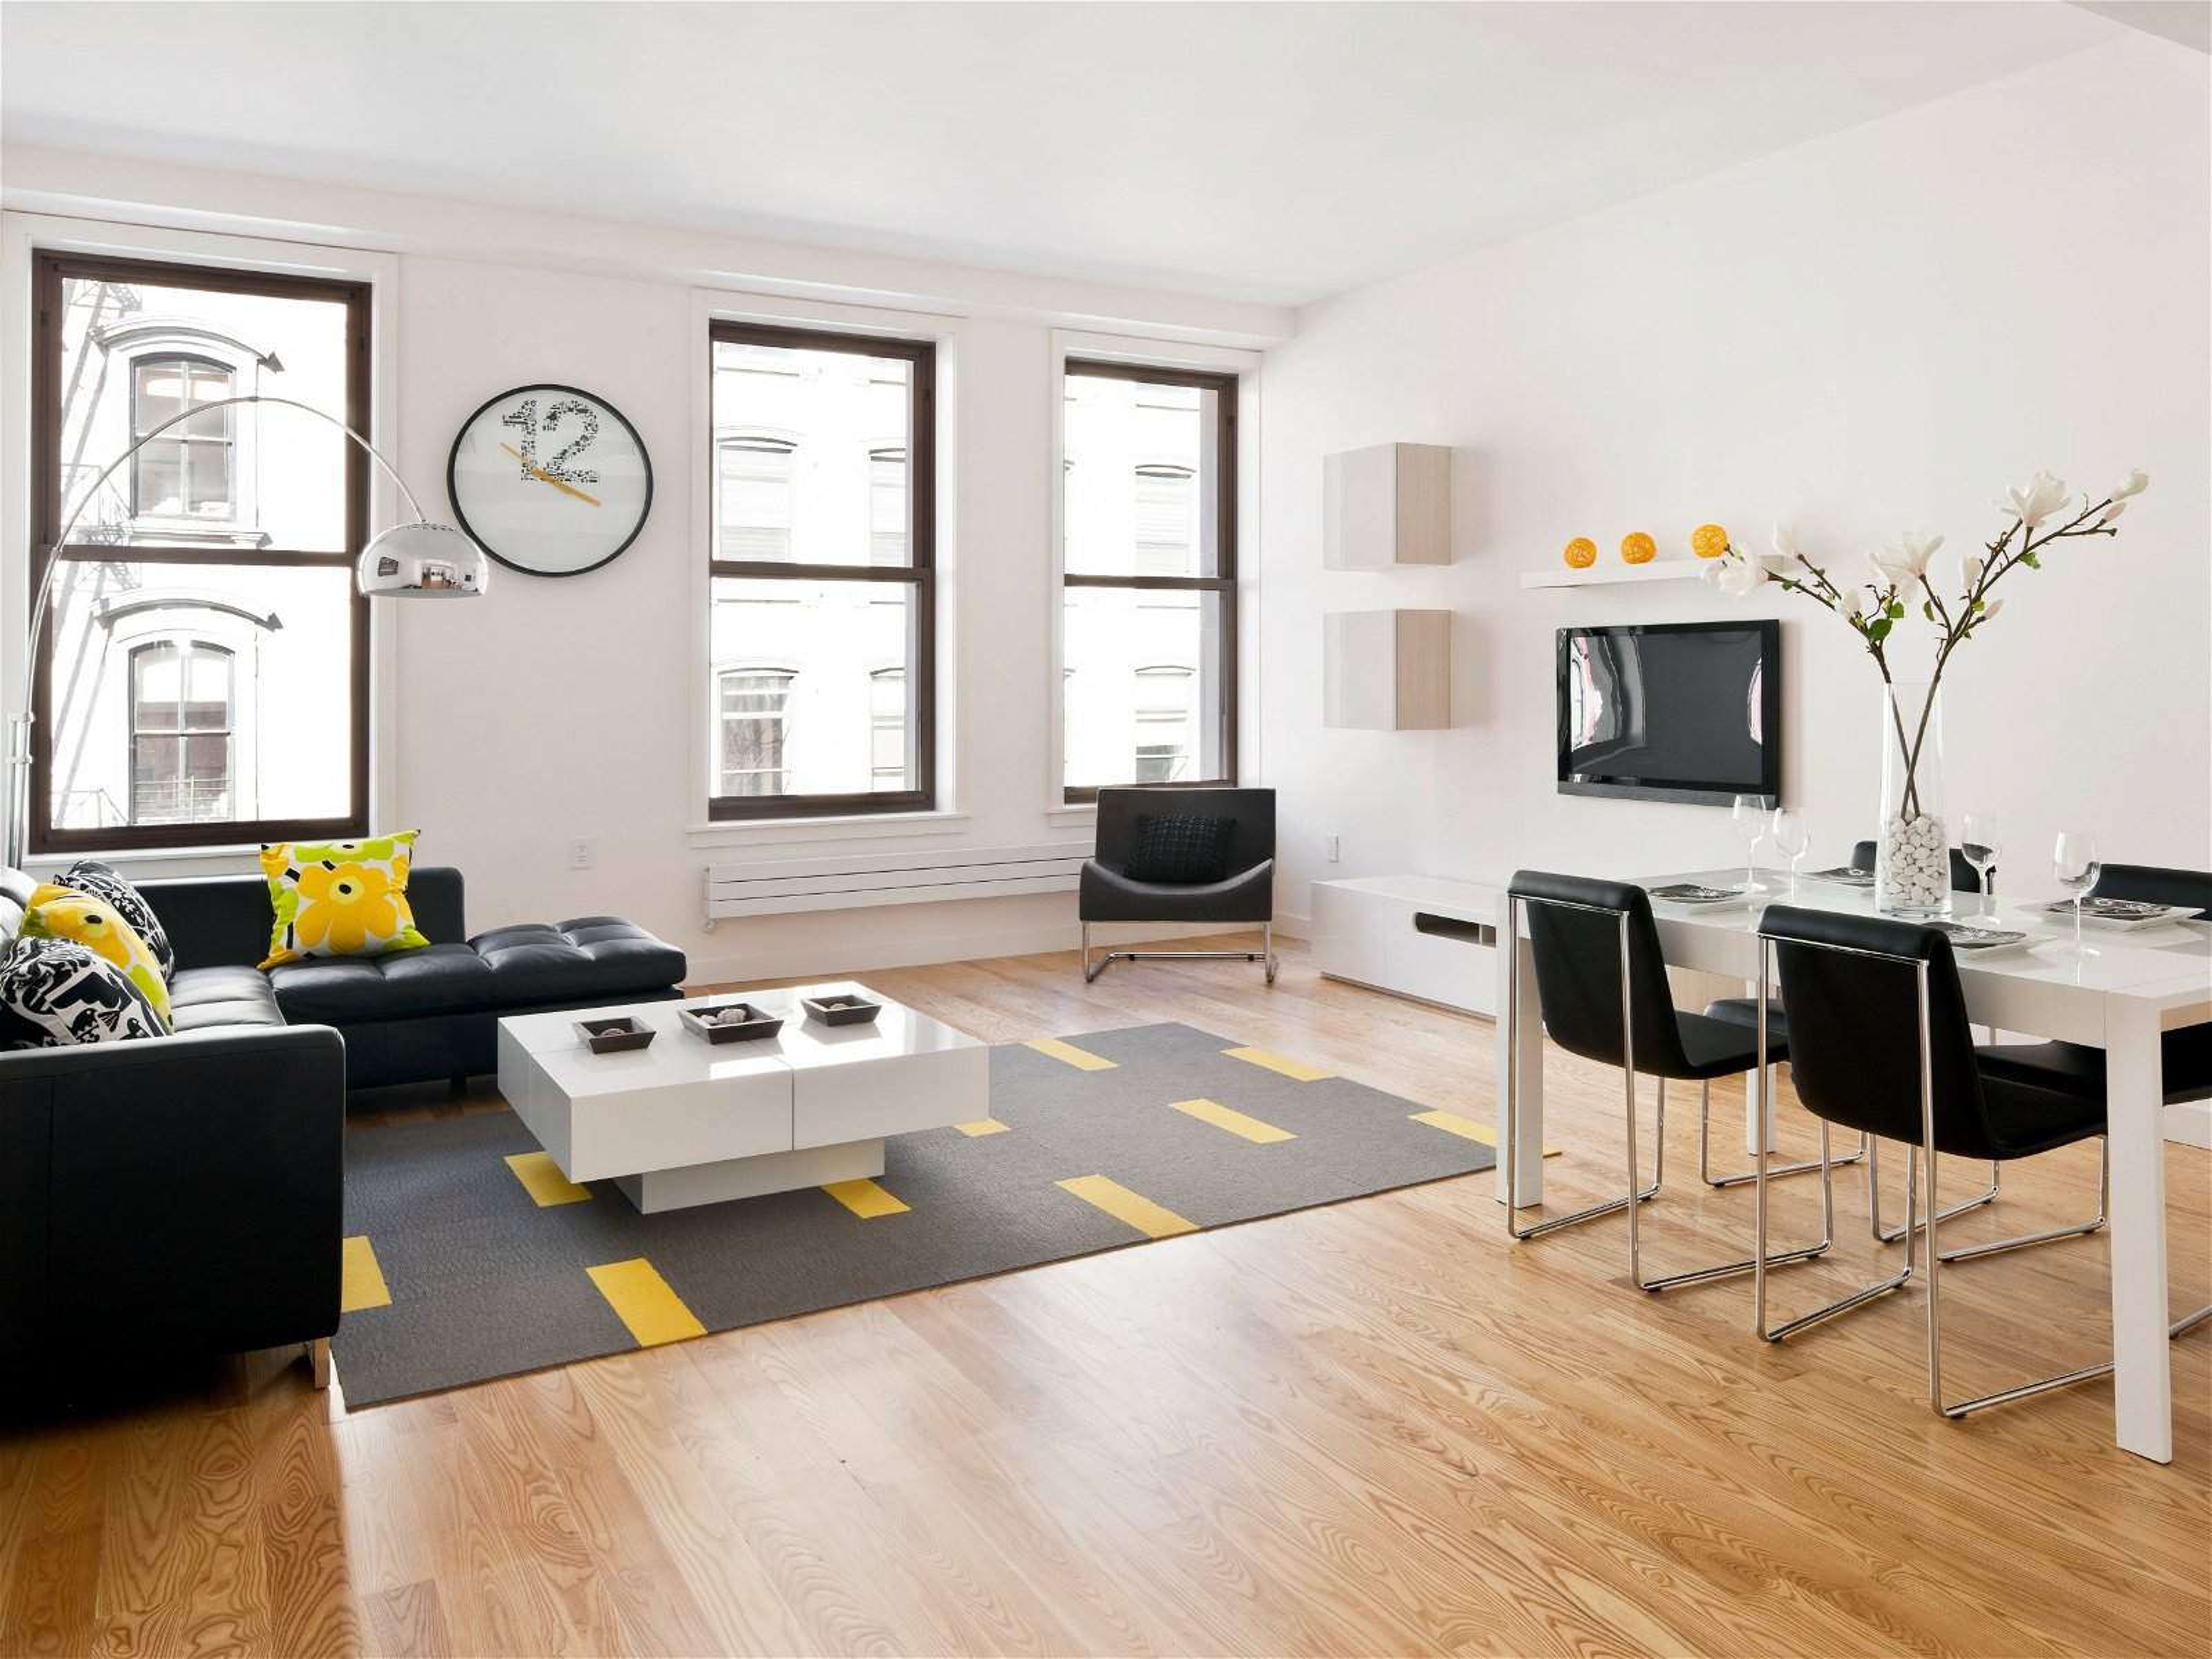 2. Design my living room online Joyce